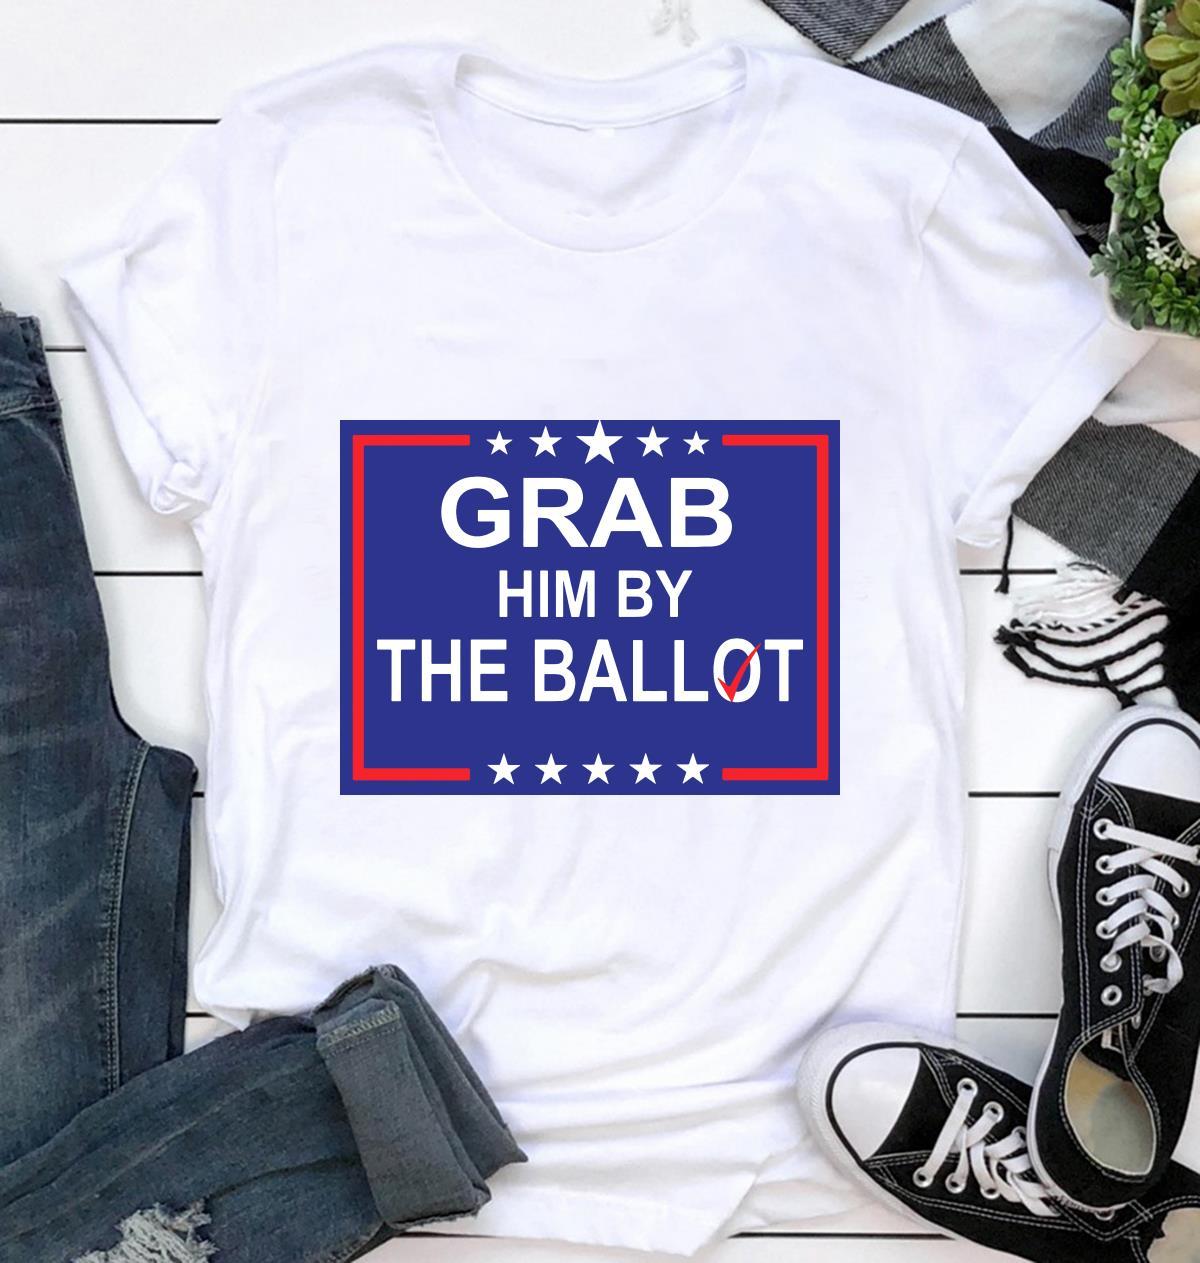 Grab him by the ballot nov 3 yard sign ca